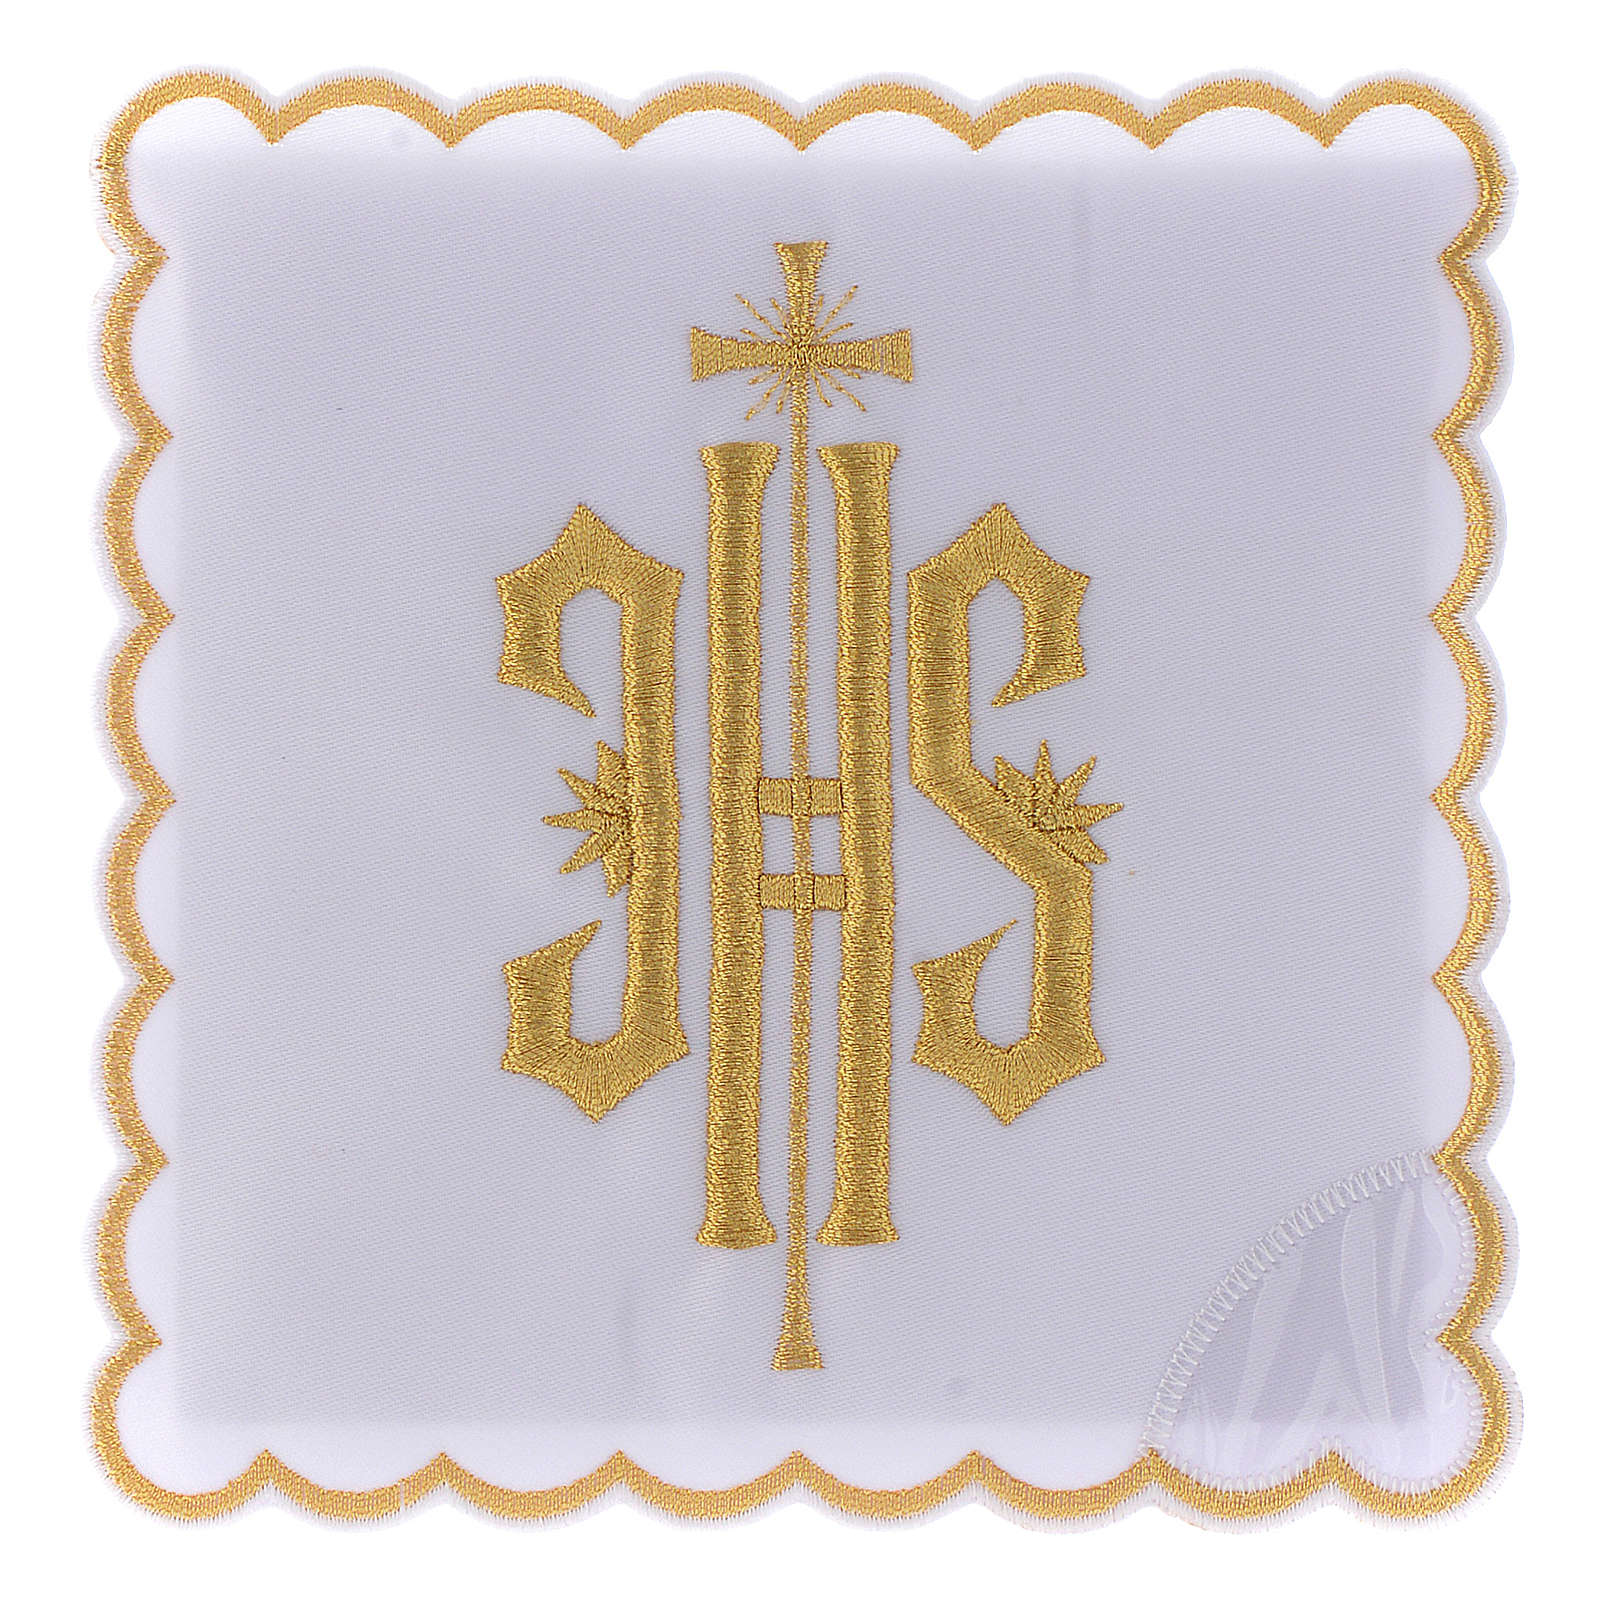 Altar linen JHS symbol golden embroided, cotton 4